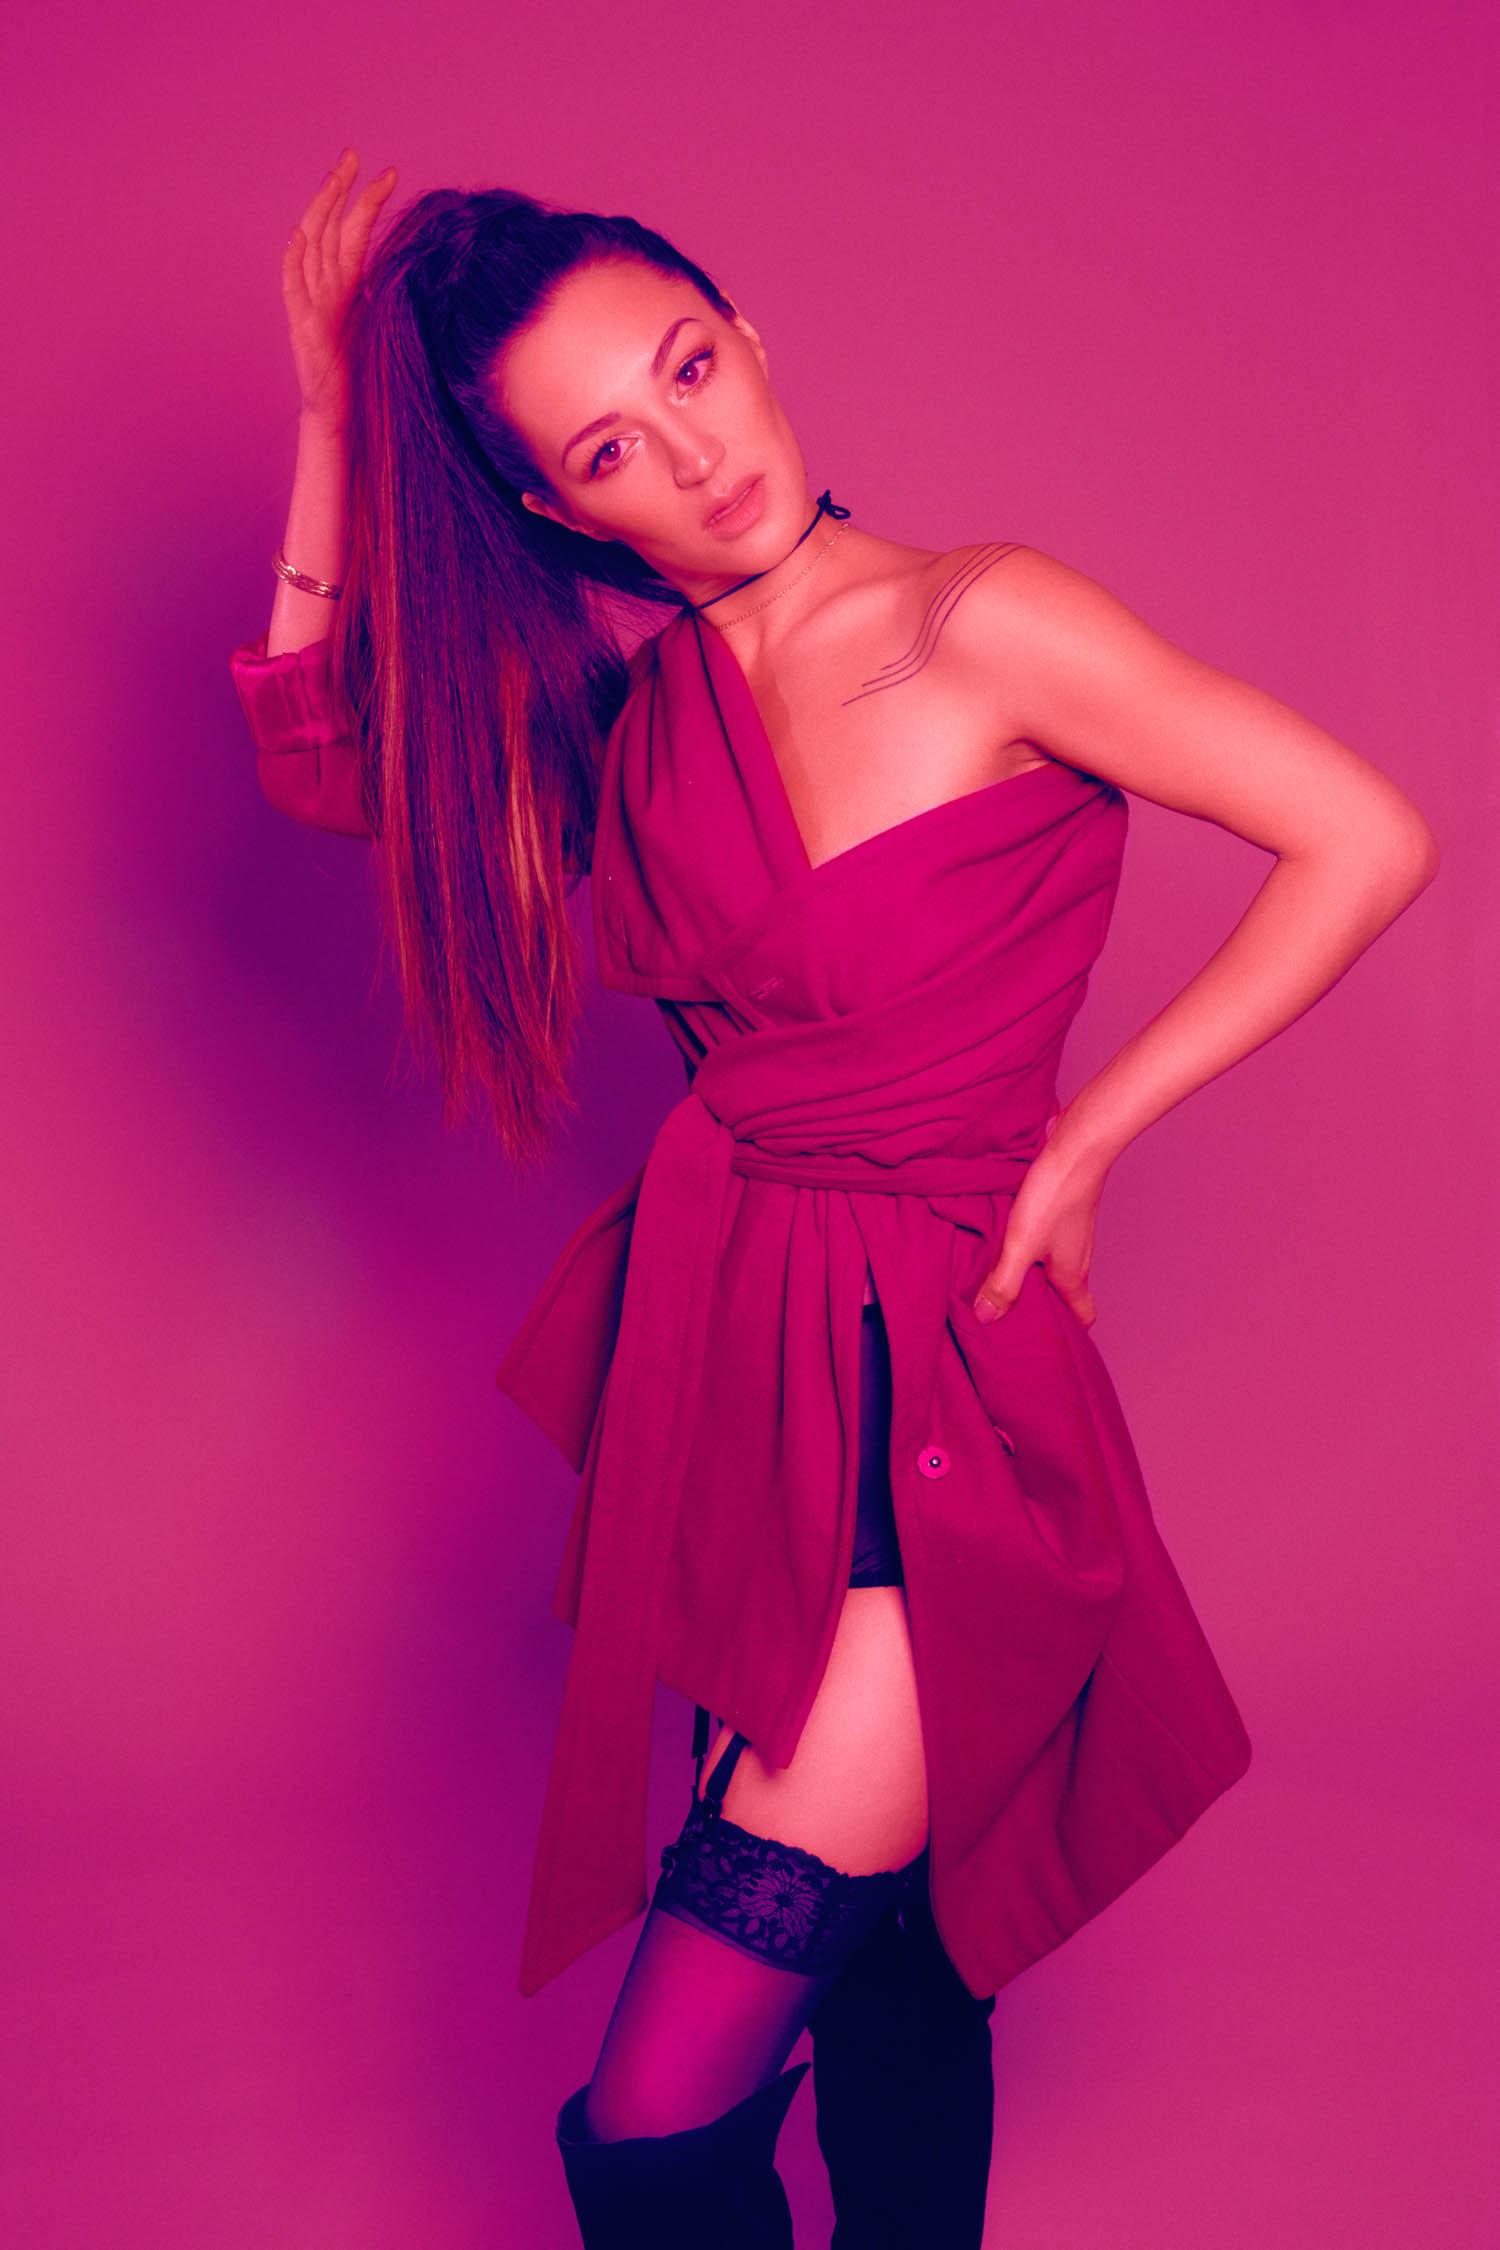 7 Rings music video inspired boudoir photography